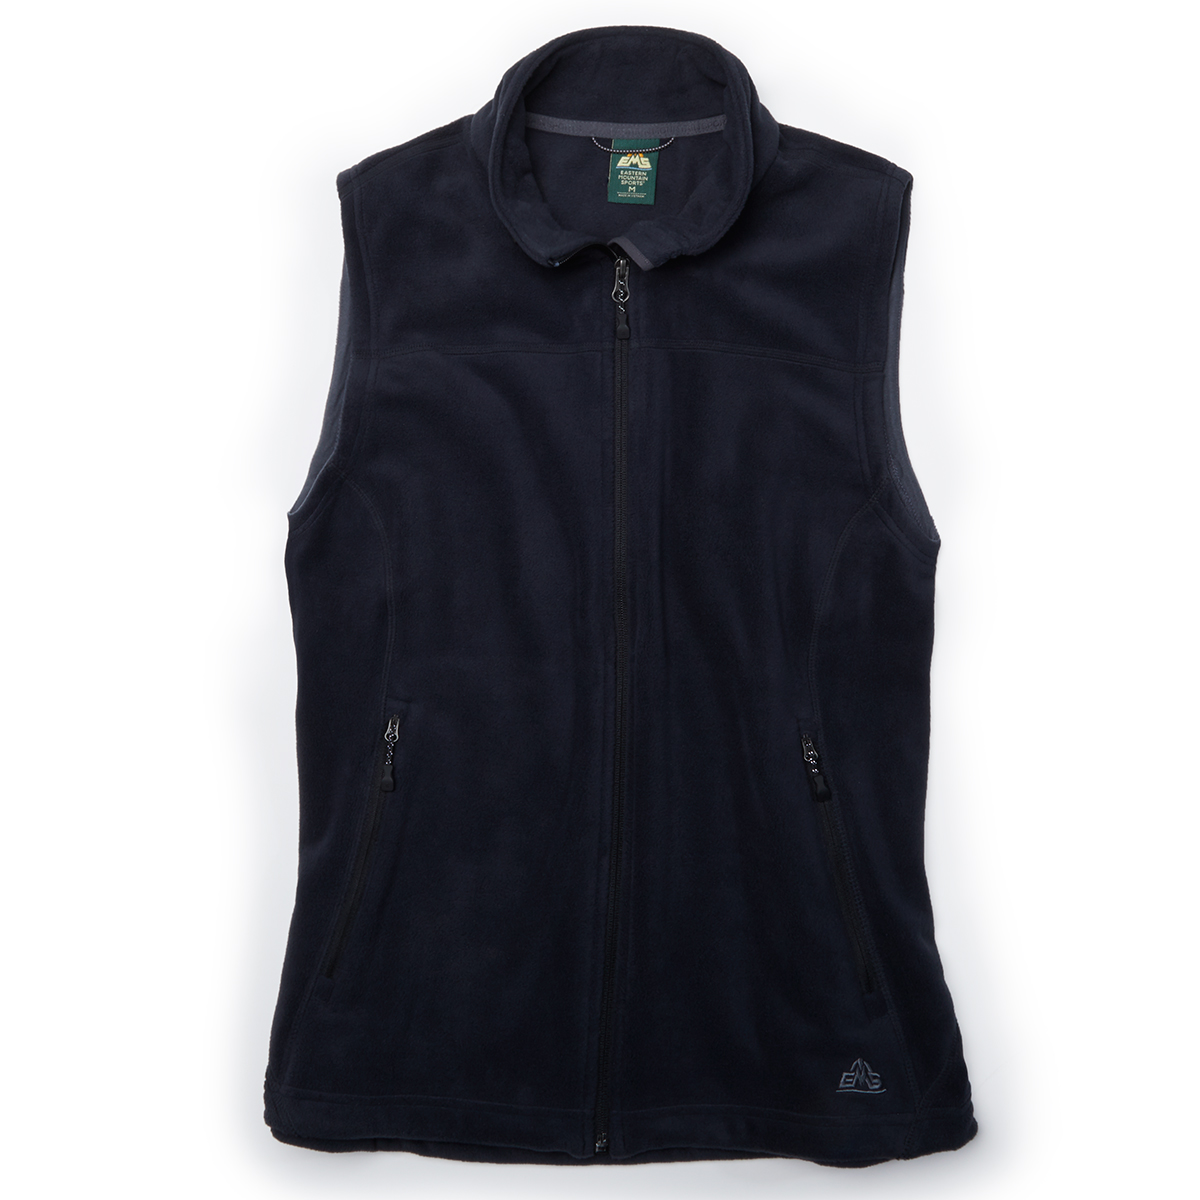 Ems Women's Classic 200 Fleece Vest - Black, XXL